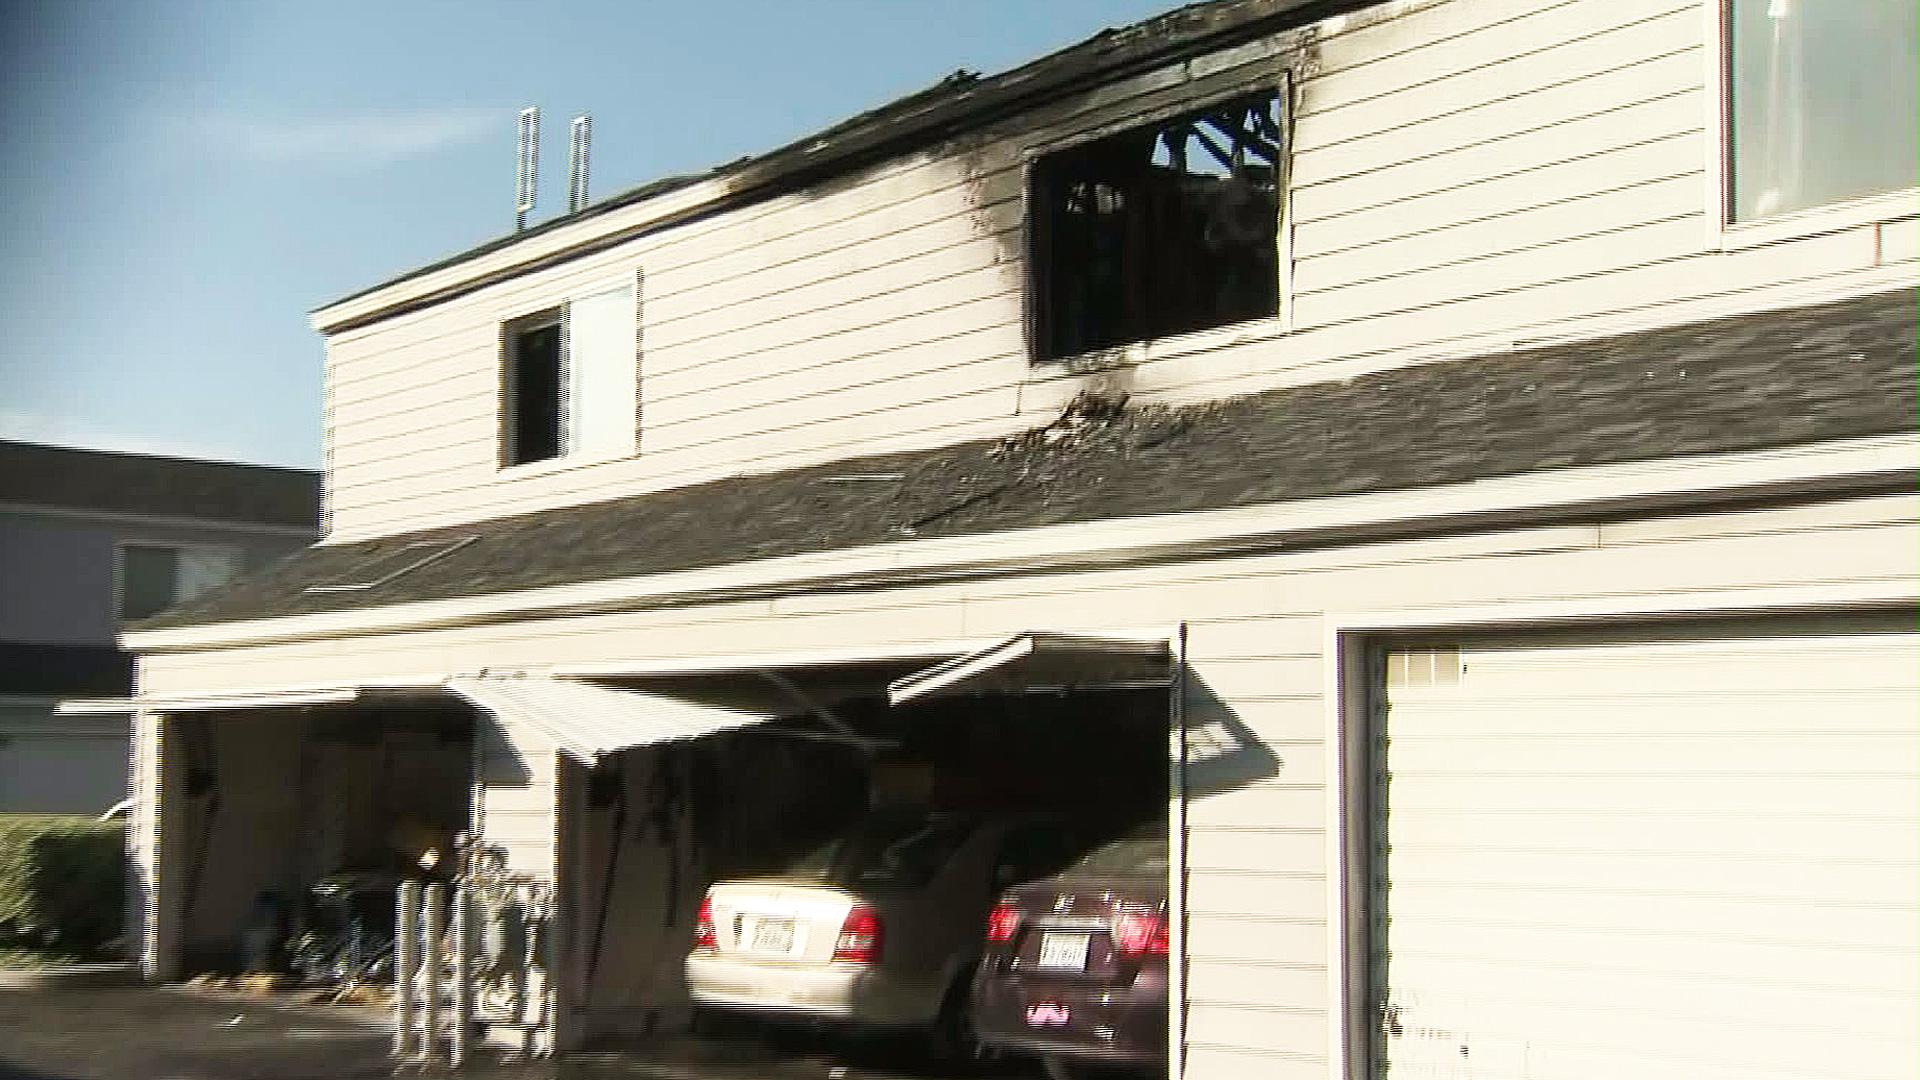 Flames erupted at a condominium in Sylmar Monday morning. (Credit: KTLA)